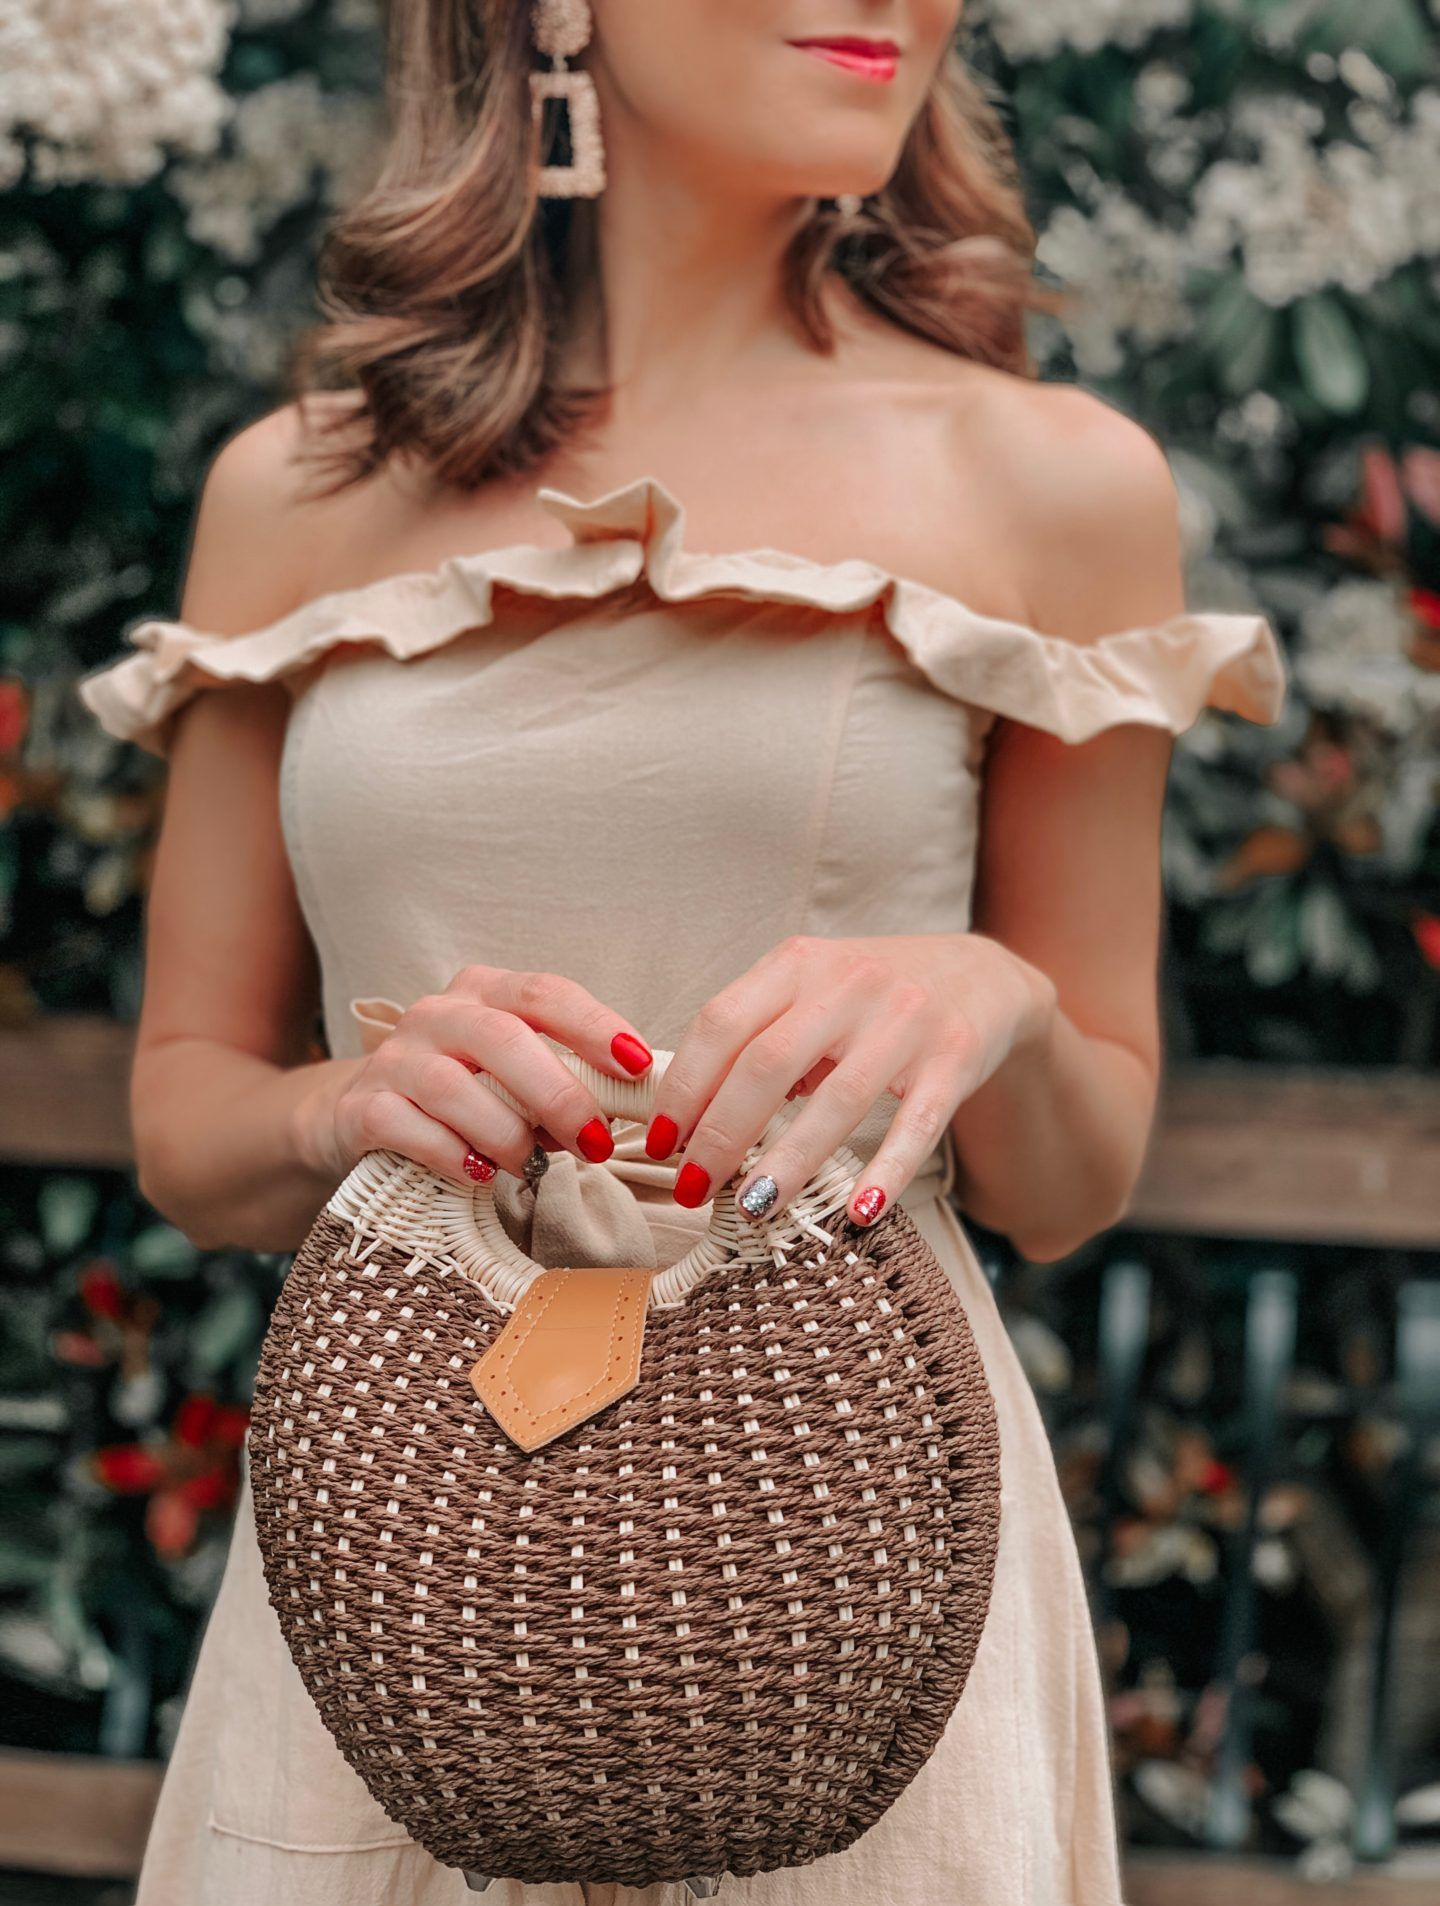 OUTFIT FROM ELEGANT DUCHESS BOUTIQUE Round Summer Beach Straw Bag | Off shoulder ruffle detail midi dress | TEXTURED GEOMETRIC EARRINGS | Pearl Hair Clip | MIU MIU SUNGLASSES